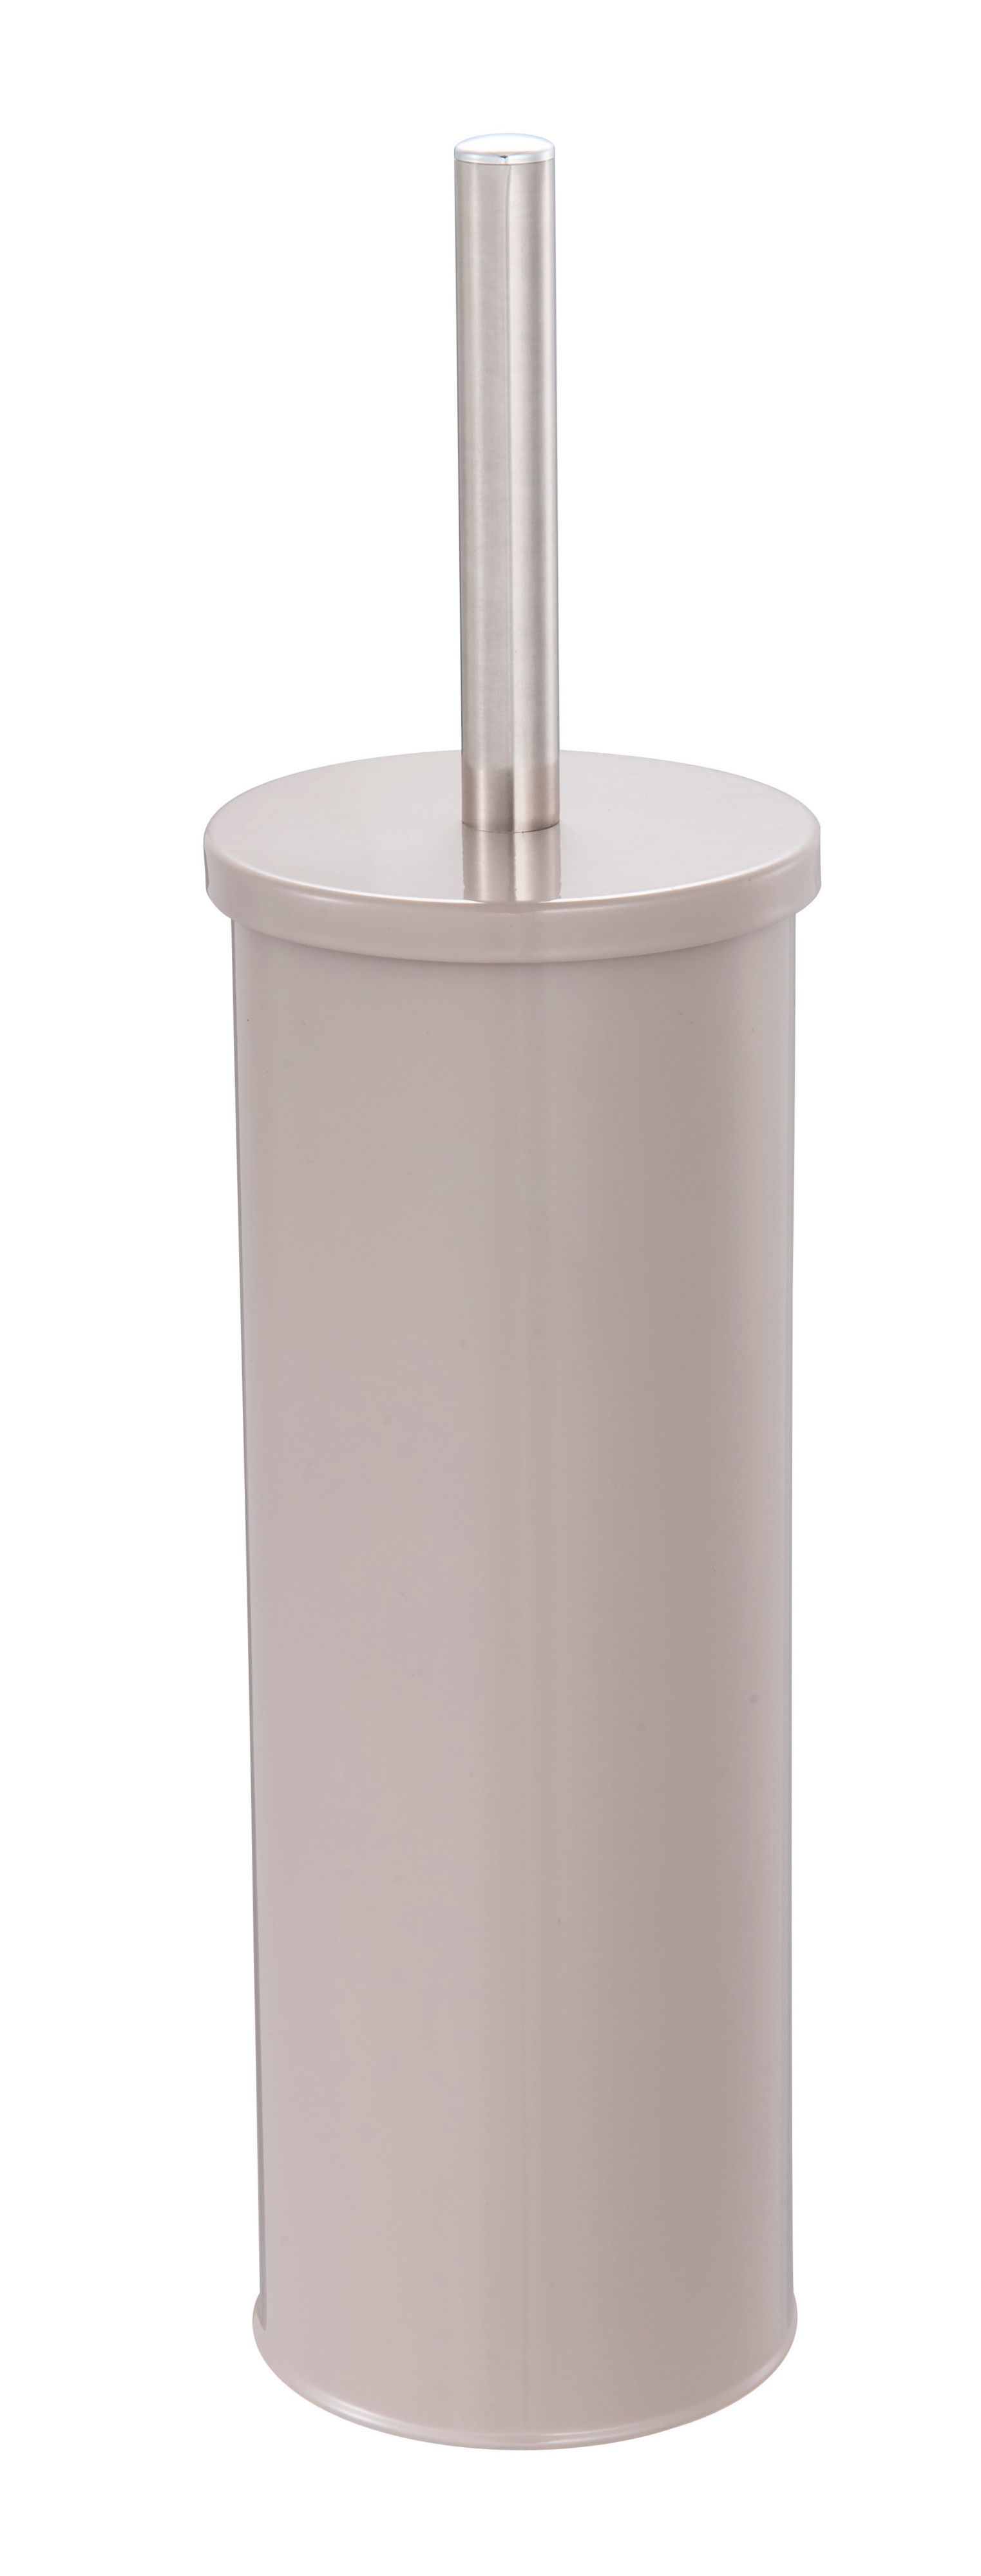 cooke lewis baya taupe power coated toilet brush. Black Bedroom Furniture Sets. Home Design Ideas